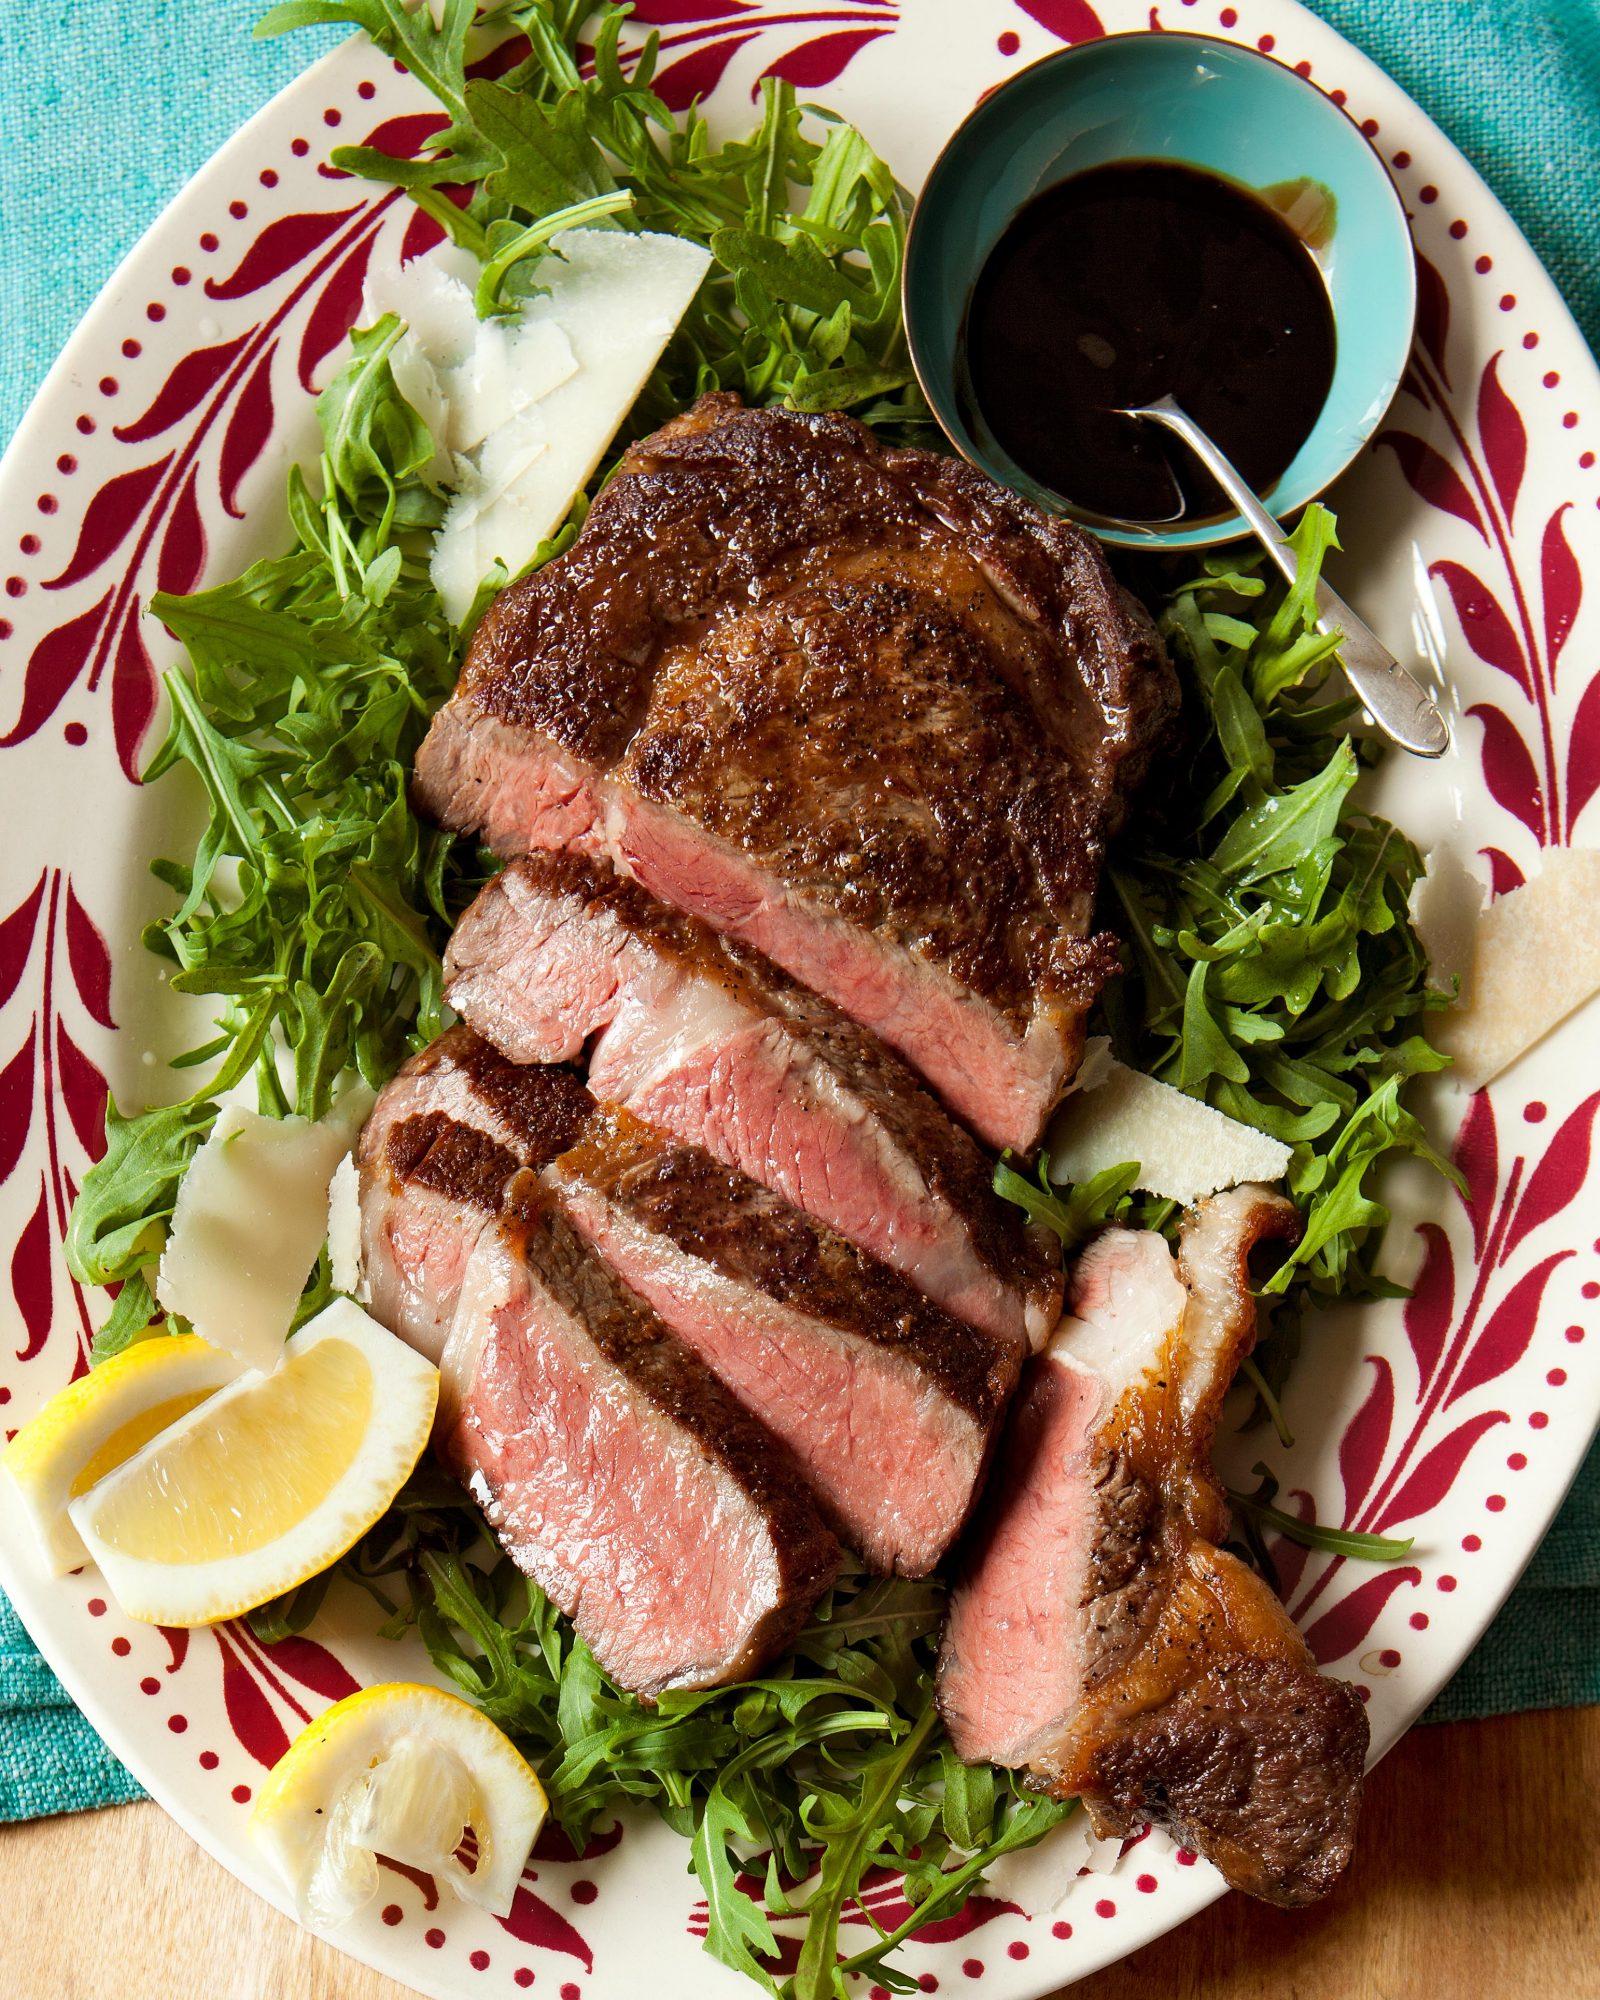 Steak with Arugula & Tangy Glaze